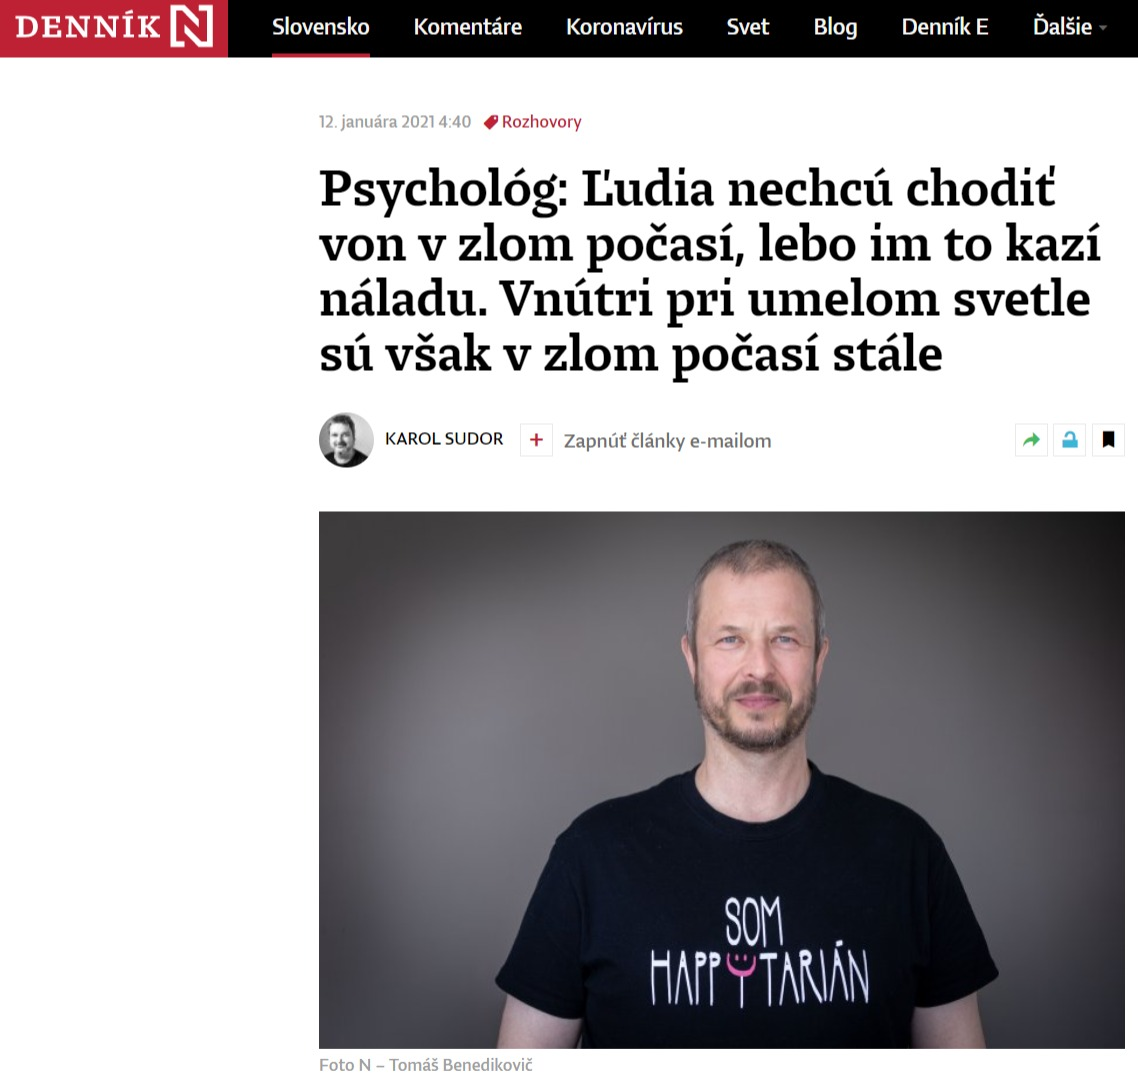 denník n v médiách aleš bednařík karol sudor